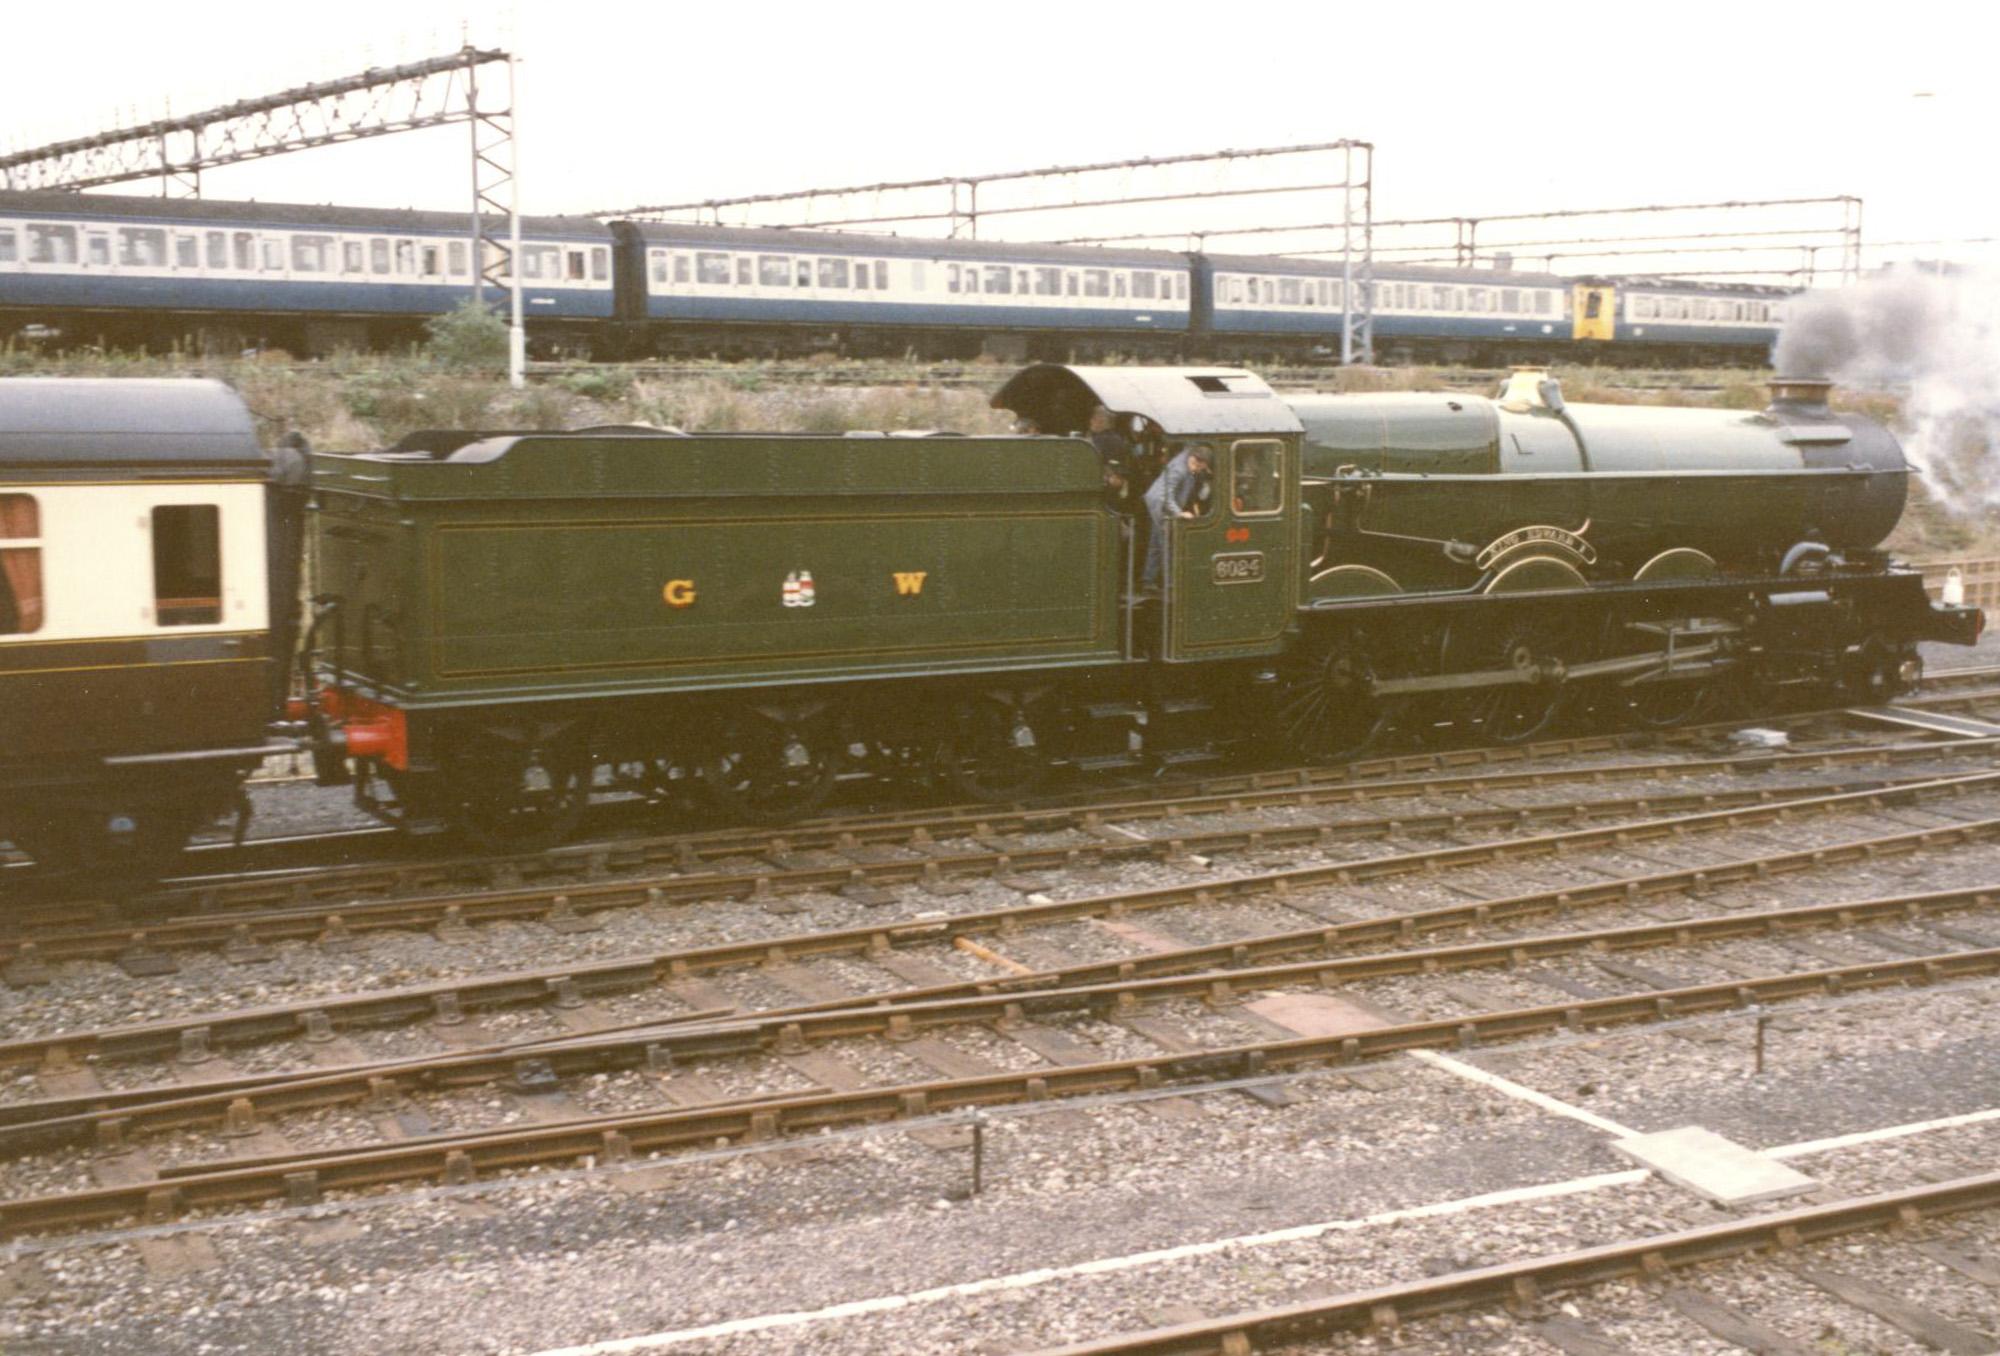 No. 6024 at Tyseley, April 1990. © Chris Brown